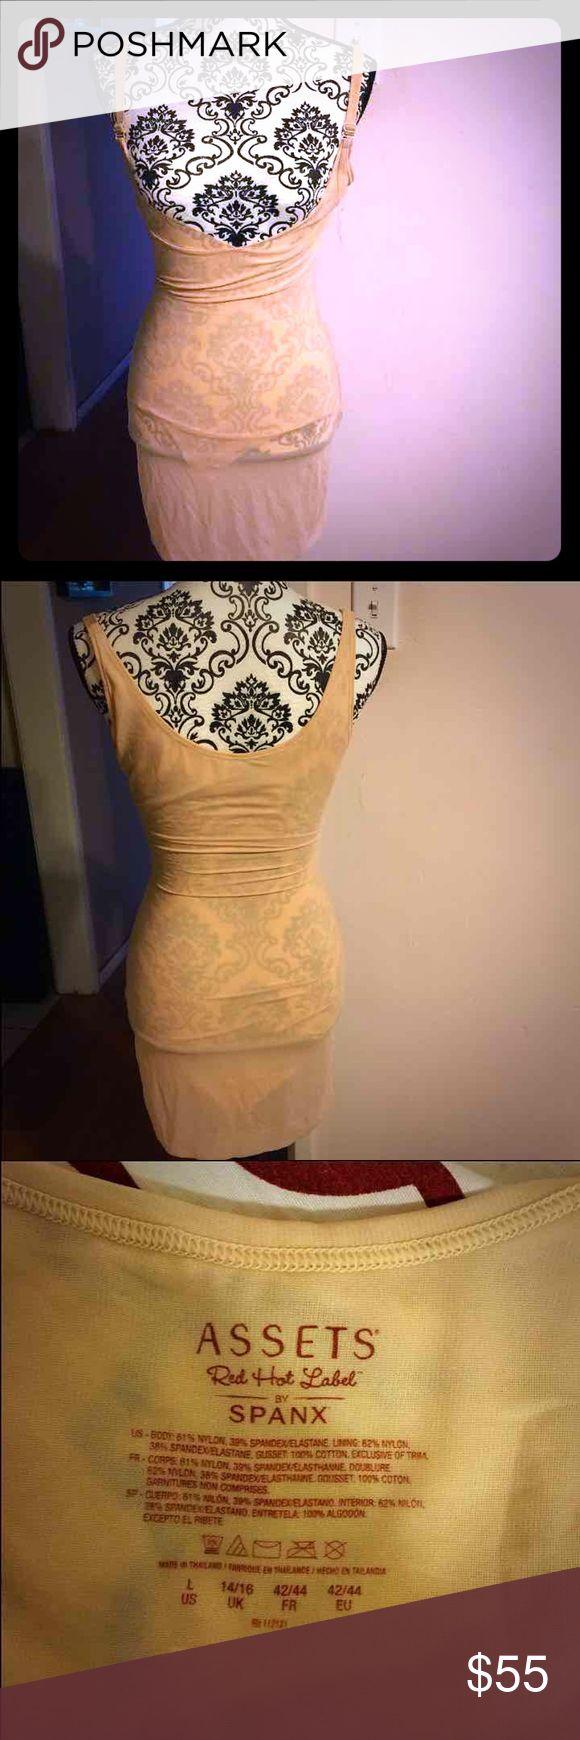 SPANX SLIP Used once for a wedding, SPANX size L SPANX Intimates & Sleepwear Chemises & Slips